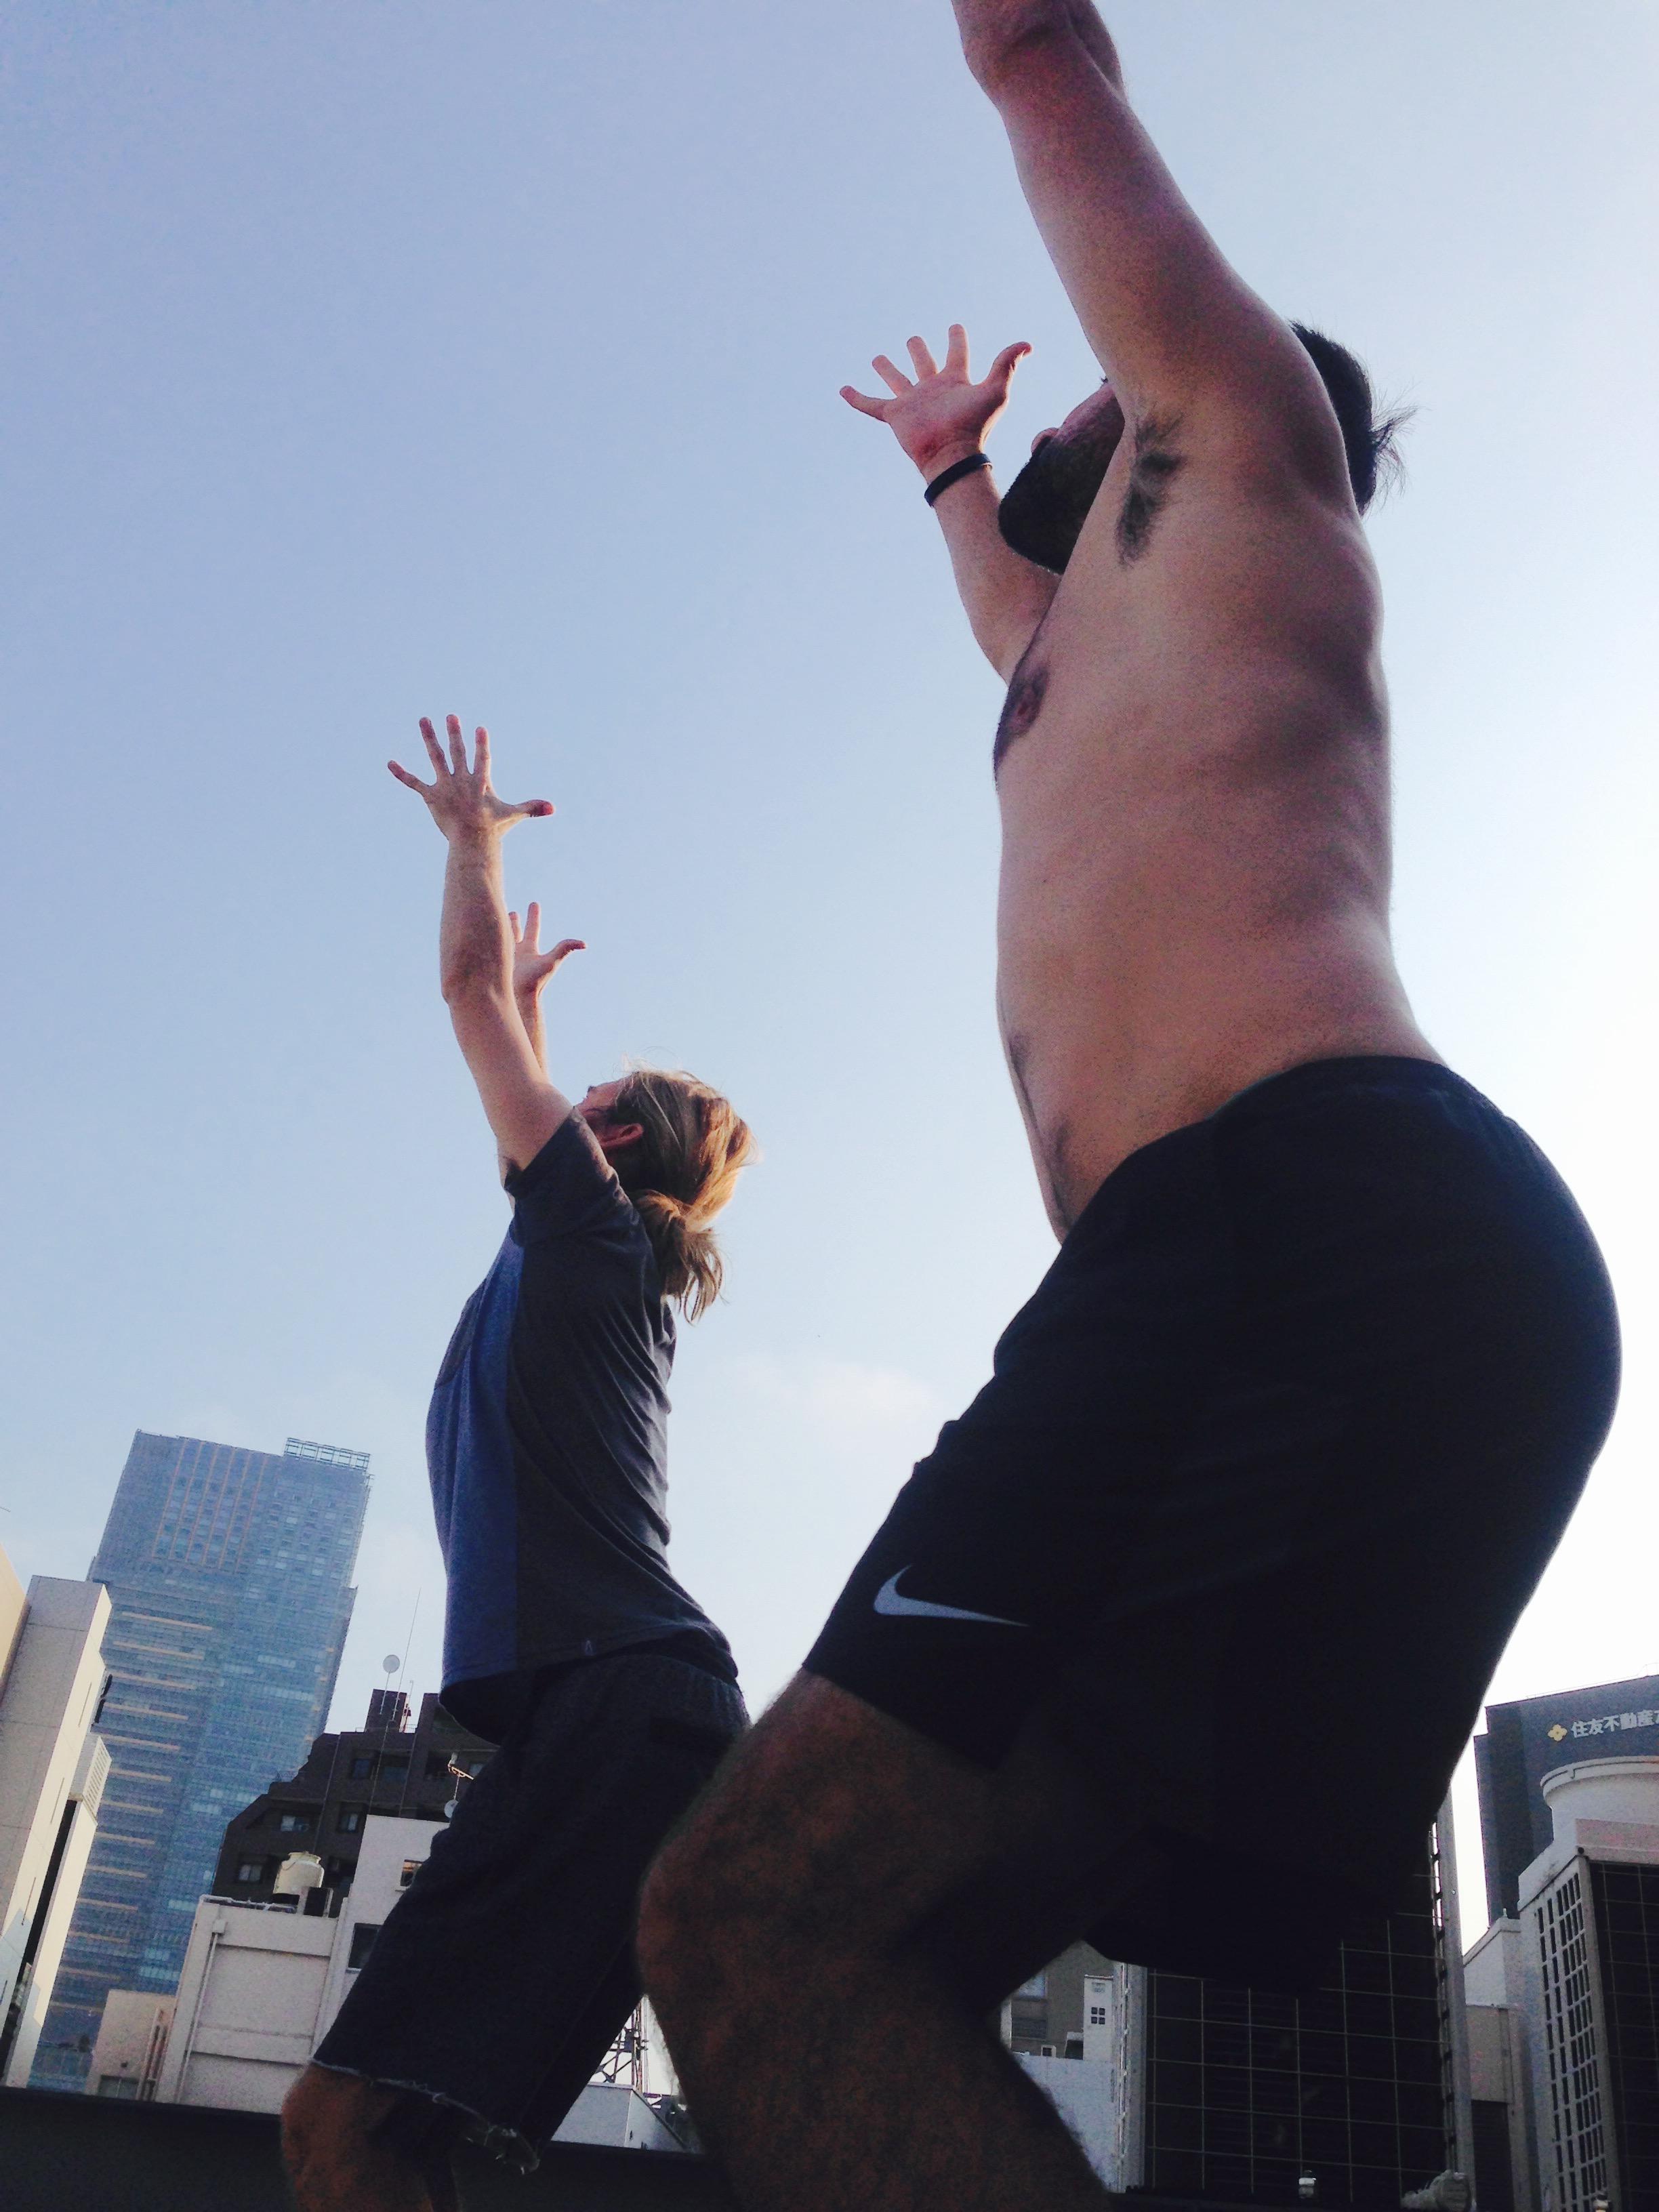 Donny leading a class of Donny's (aka Wylie leads a yoga class)